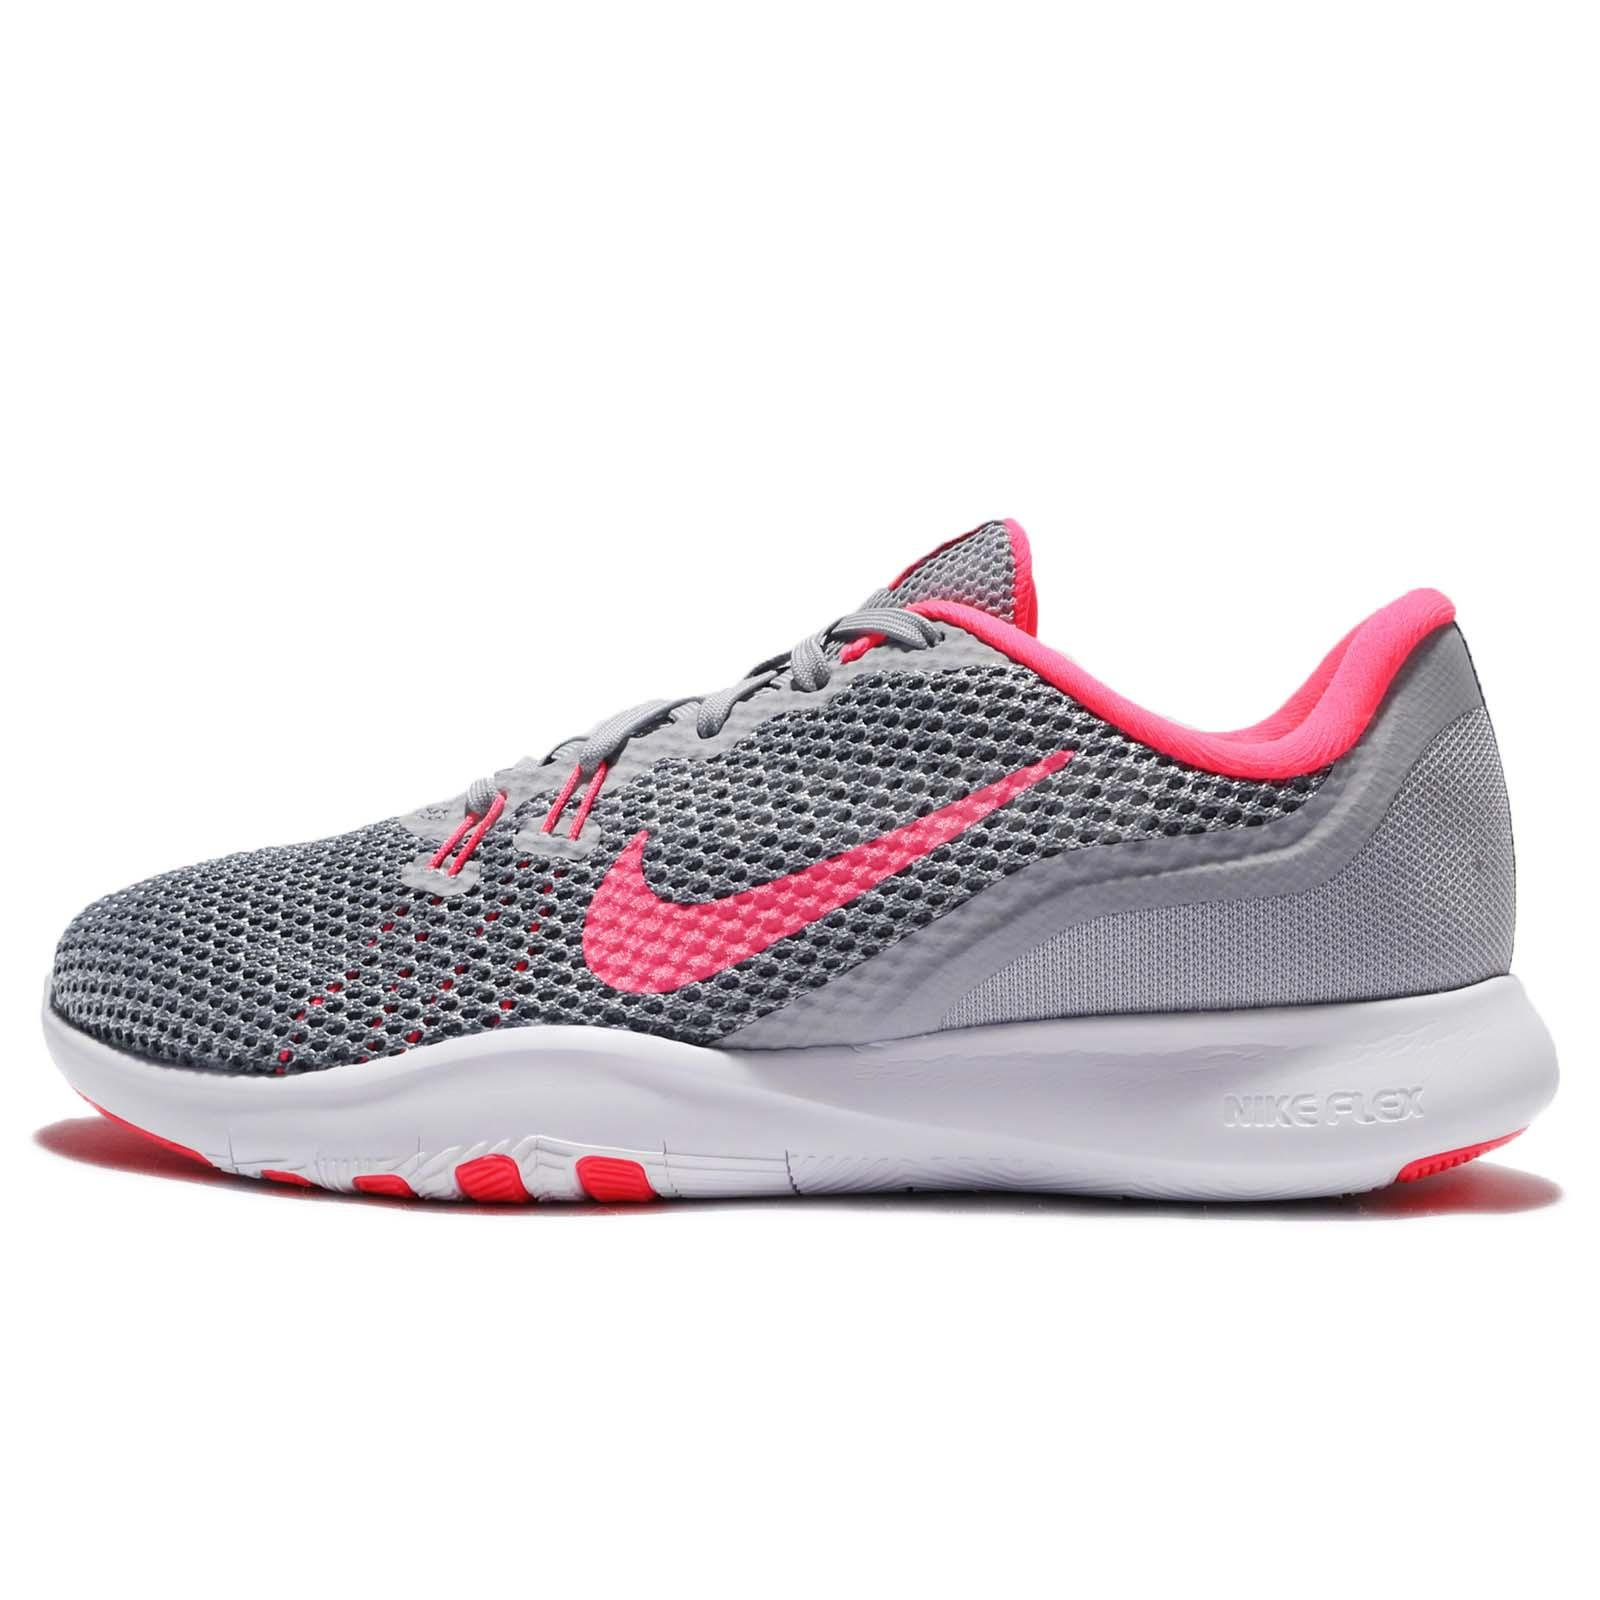 6e1a7dd22db2 Nike Wmns Flex Trainer 7 VII Grey Pink Women Training Shoes Sneakers  898479-006